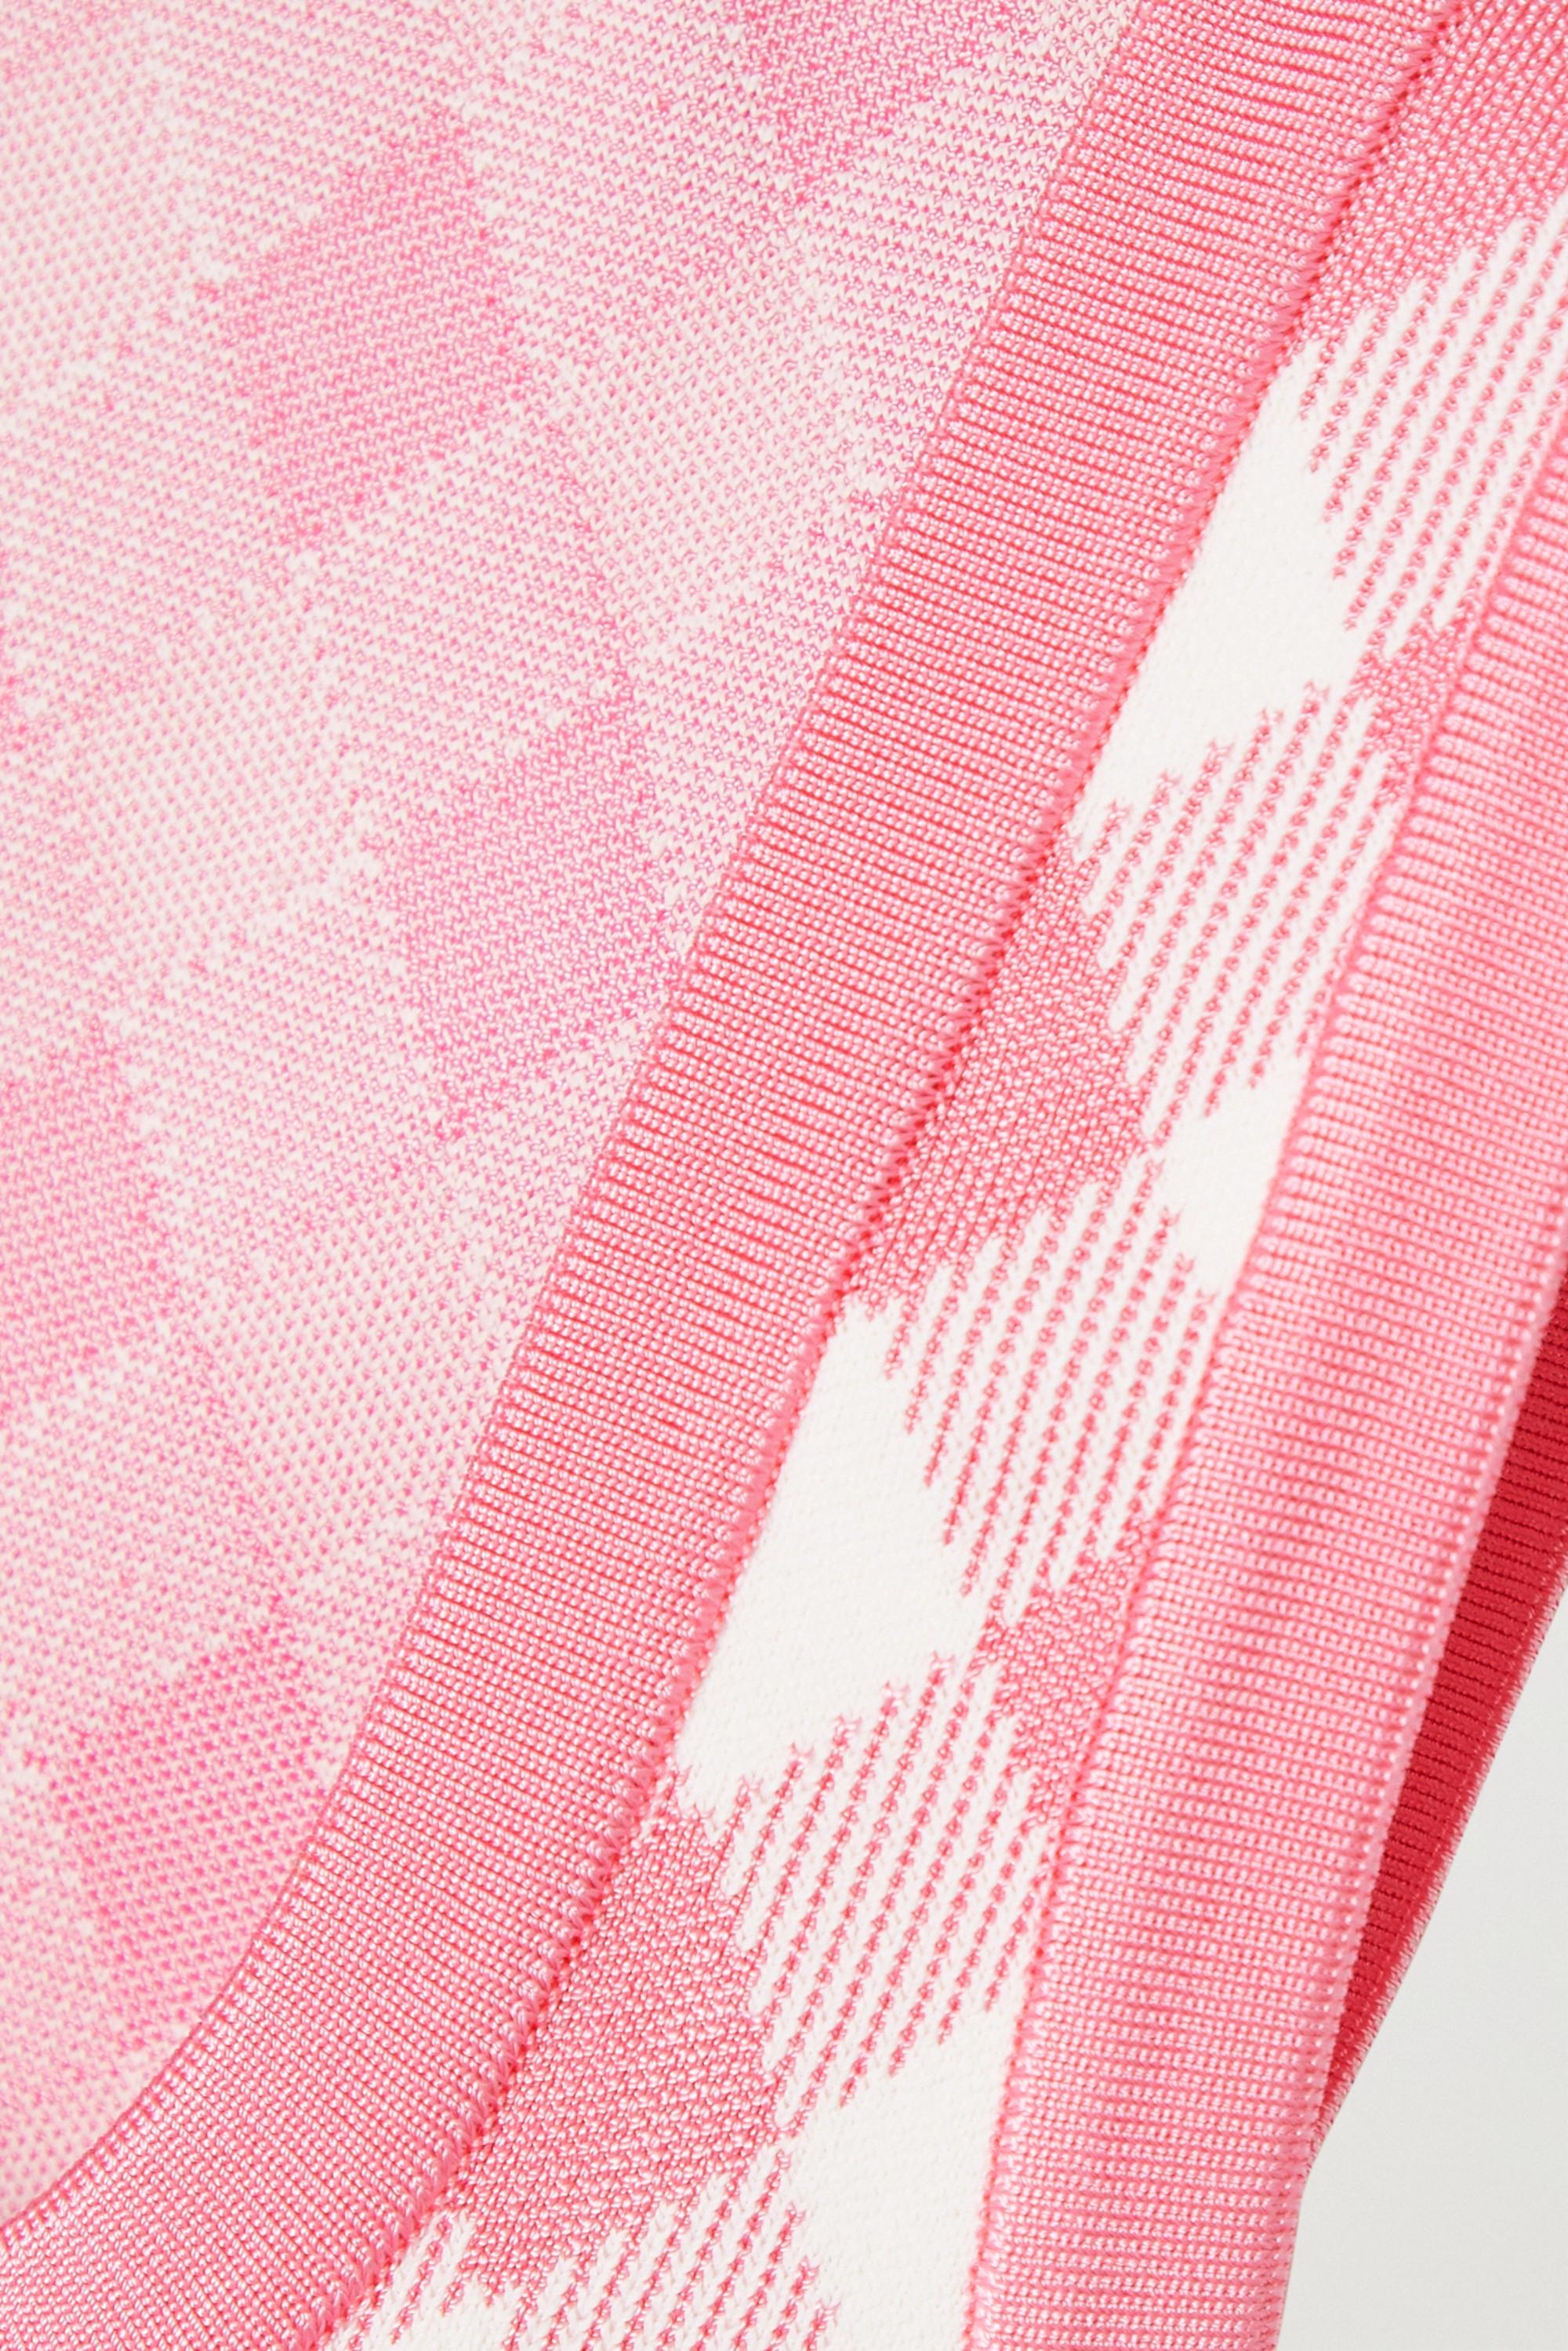 Balmain Cropped gingham jacquard-knit top